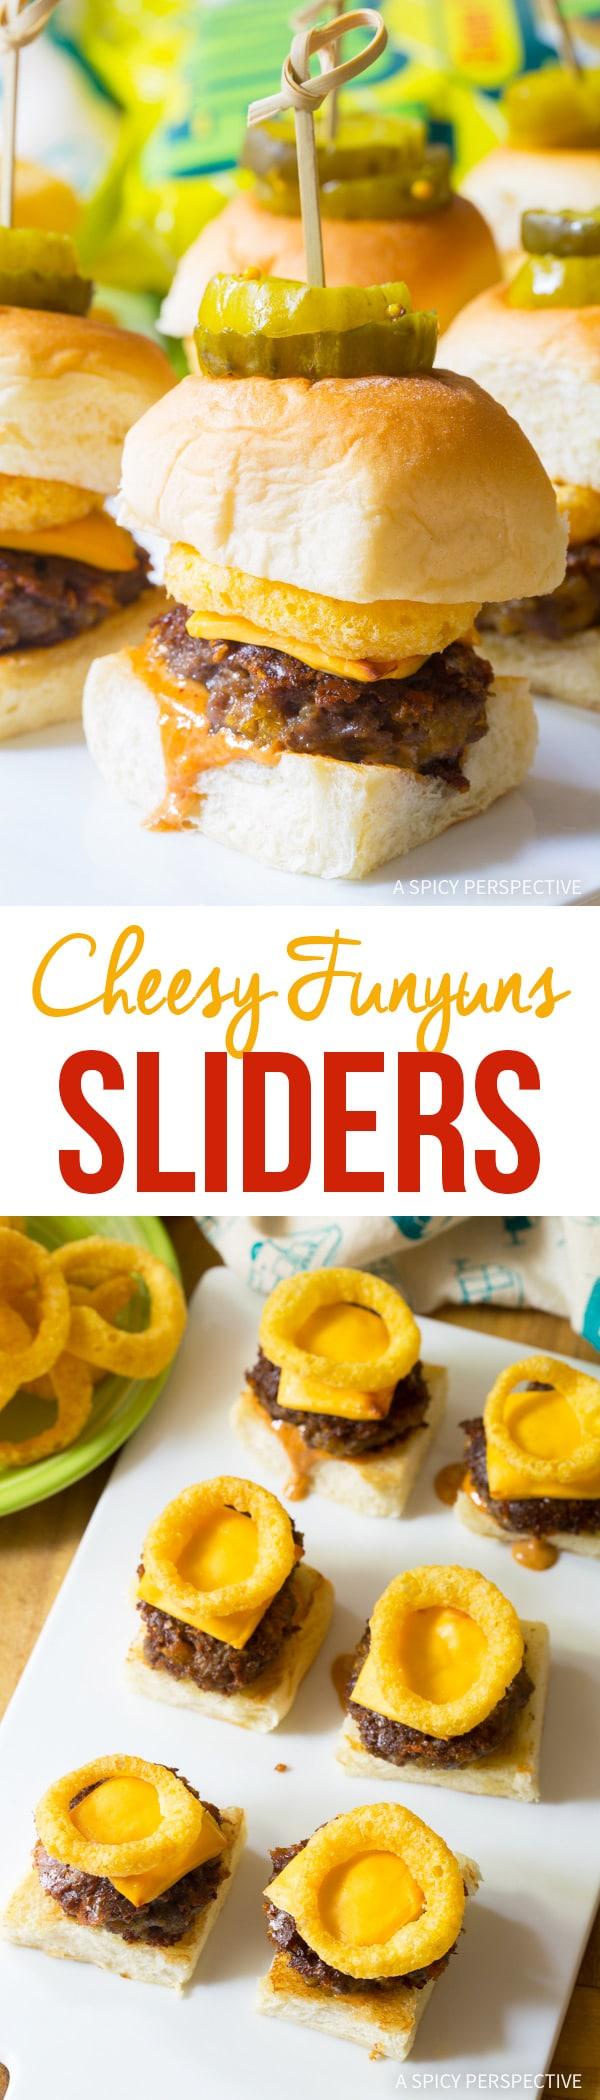 Fun Cheesy Funyuns Sliders Recipe